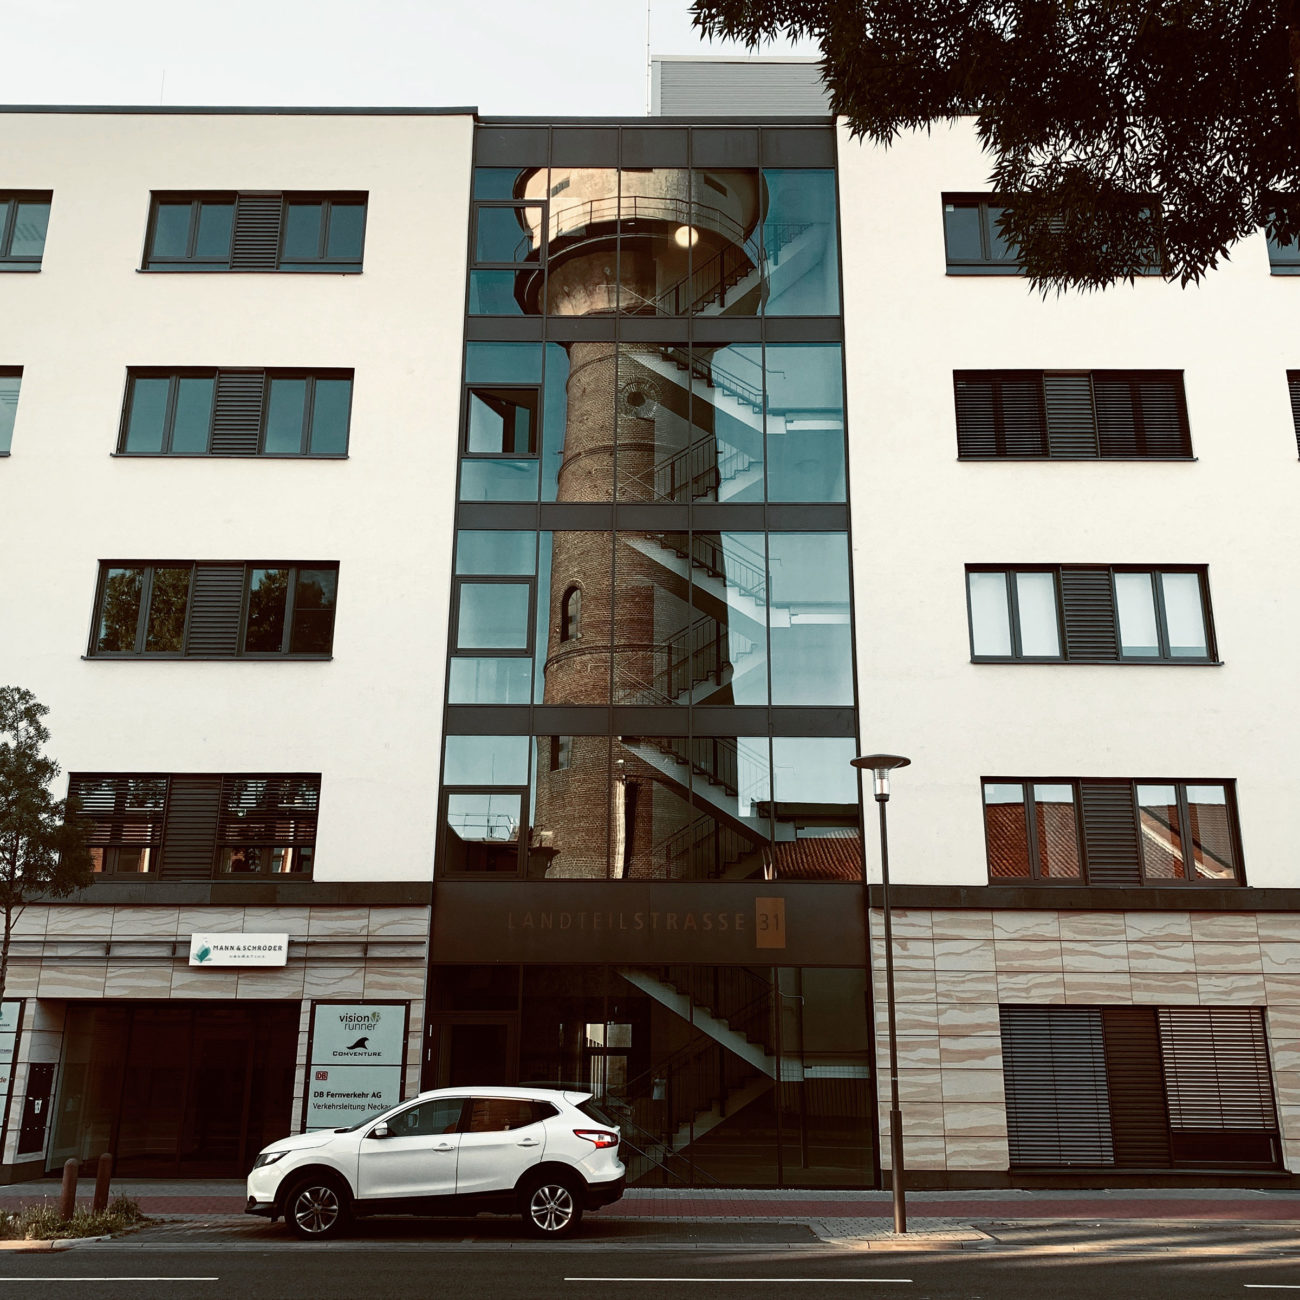 Gespiegelter Wasserturm John Deere Mannheim